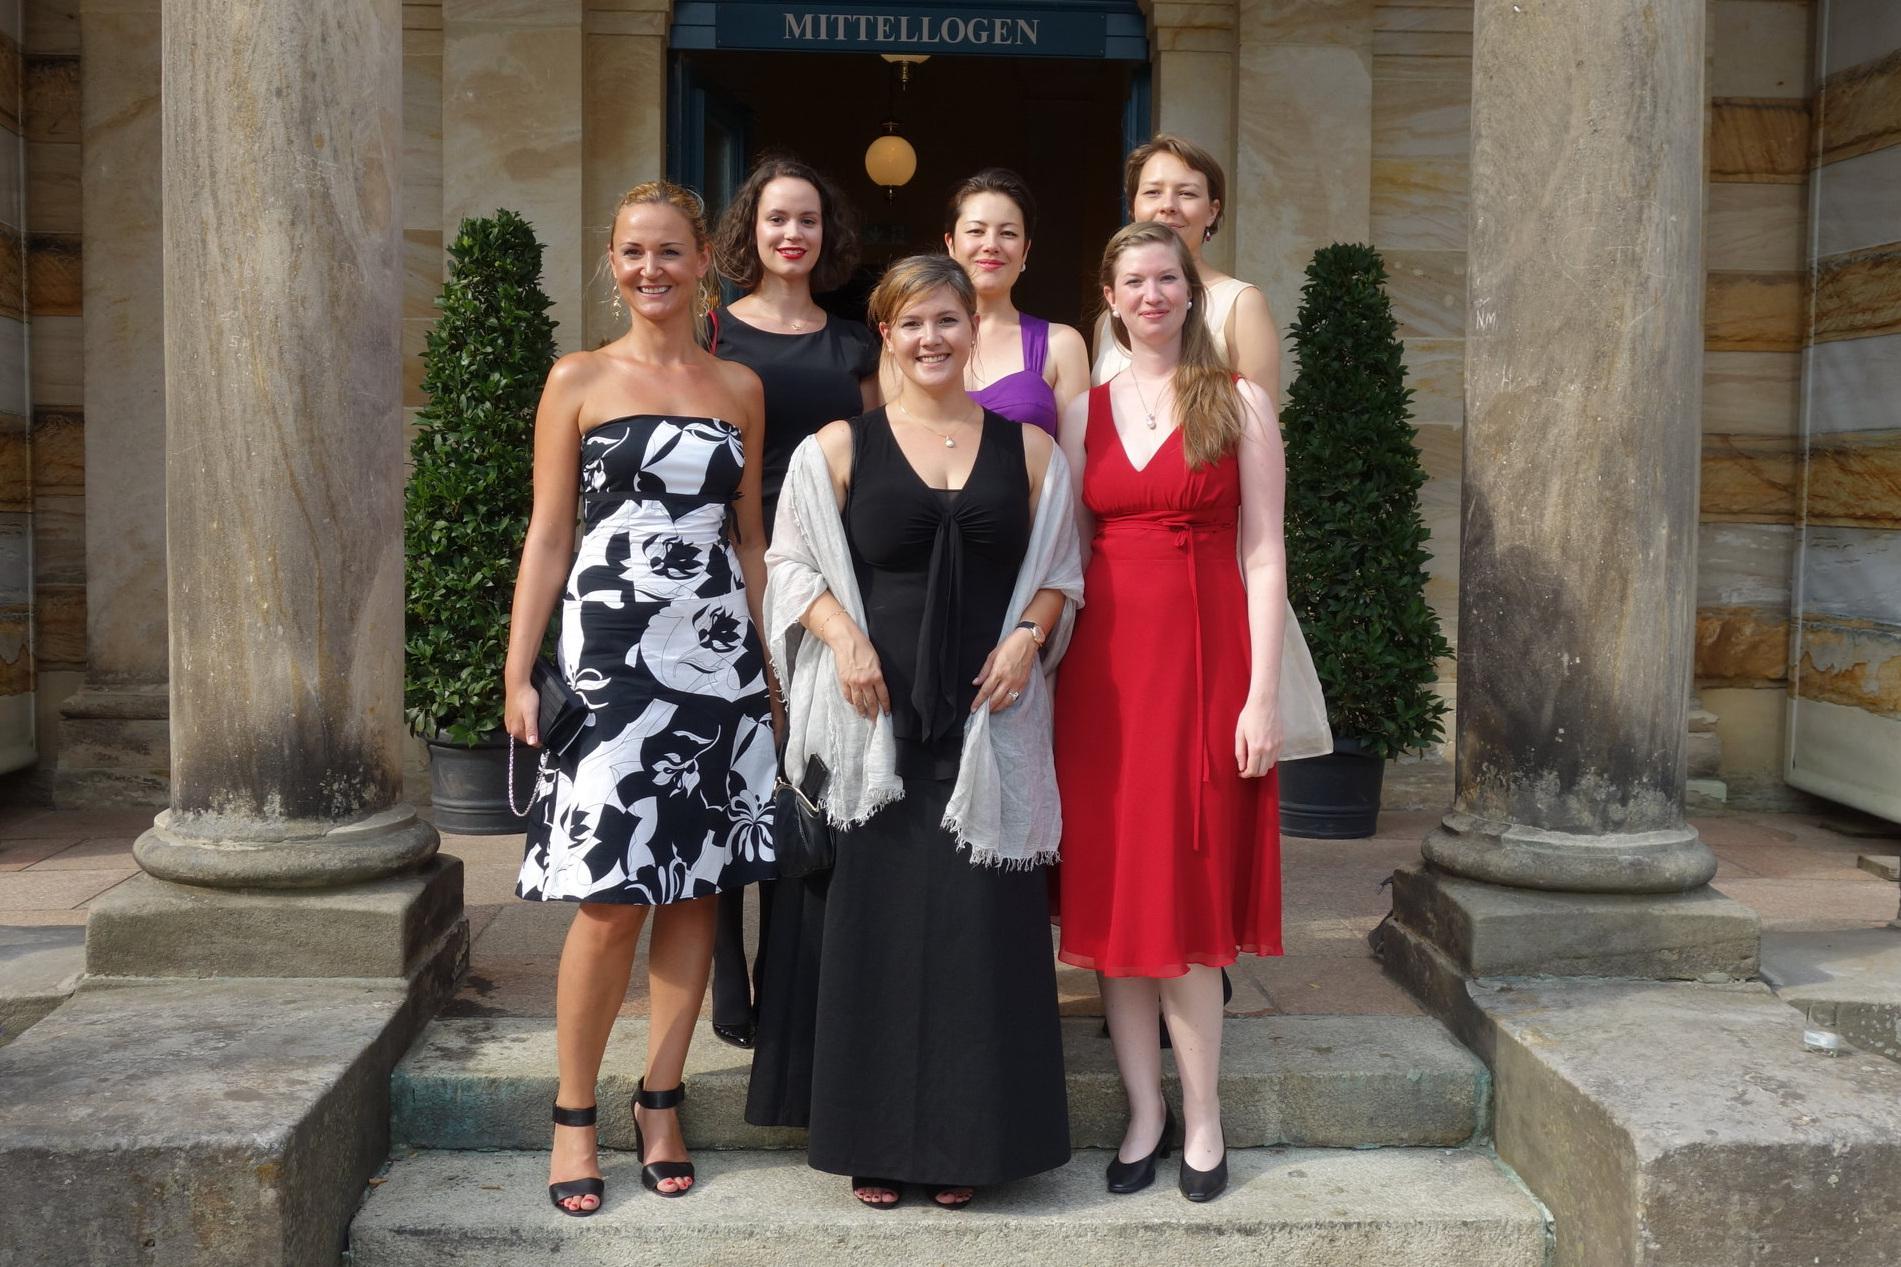 Von links nach rechts: Katrin Wundsam, Annette Hörle, Carina Grohsgart, Mariko Sudo, Marta Wryk, Janina Zell